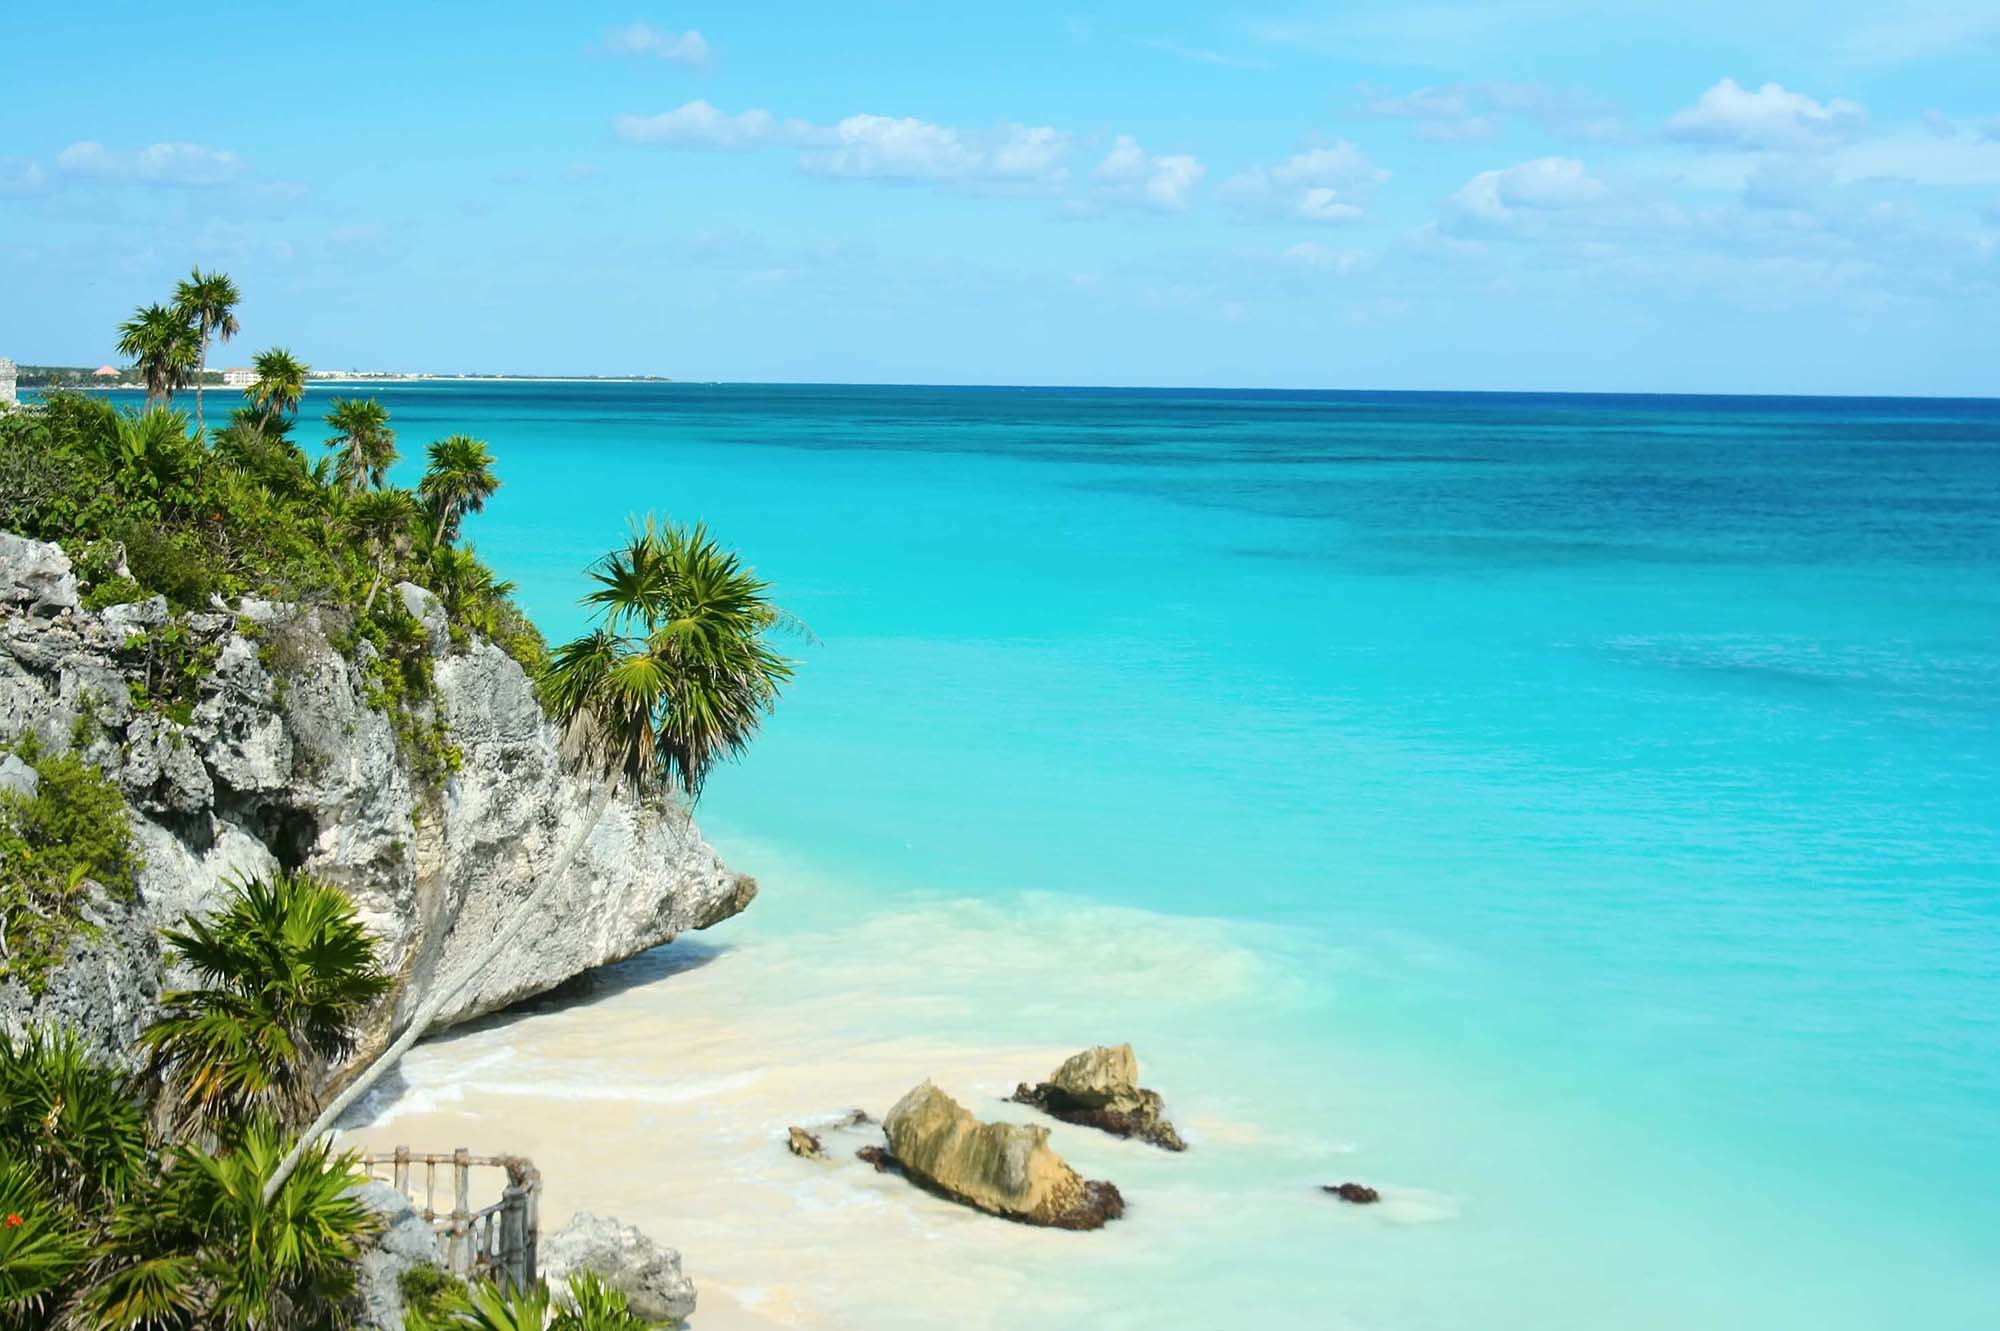 Oferta de viaje a Riviera Maya